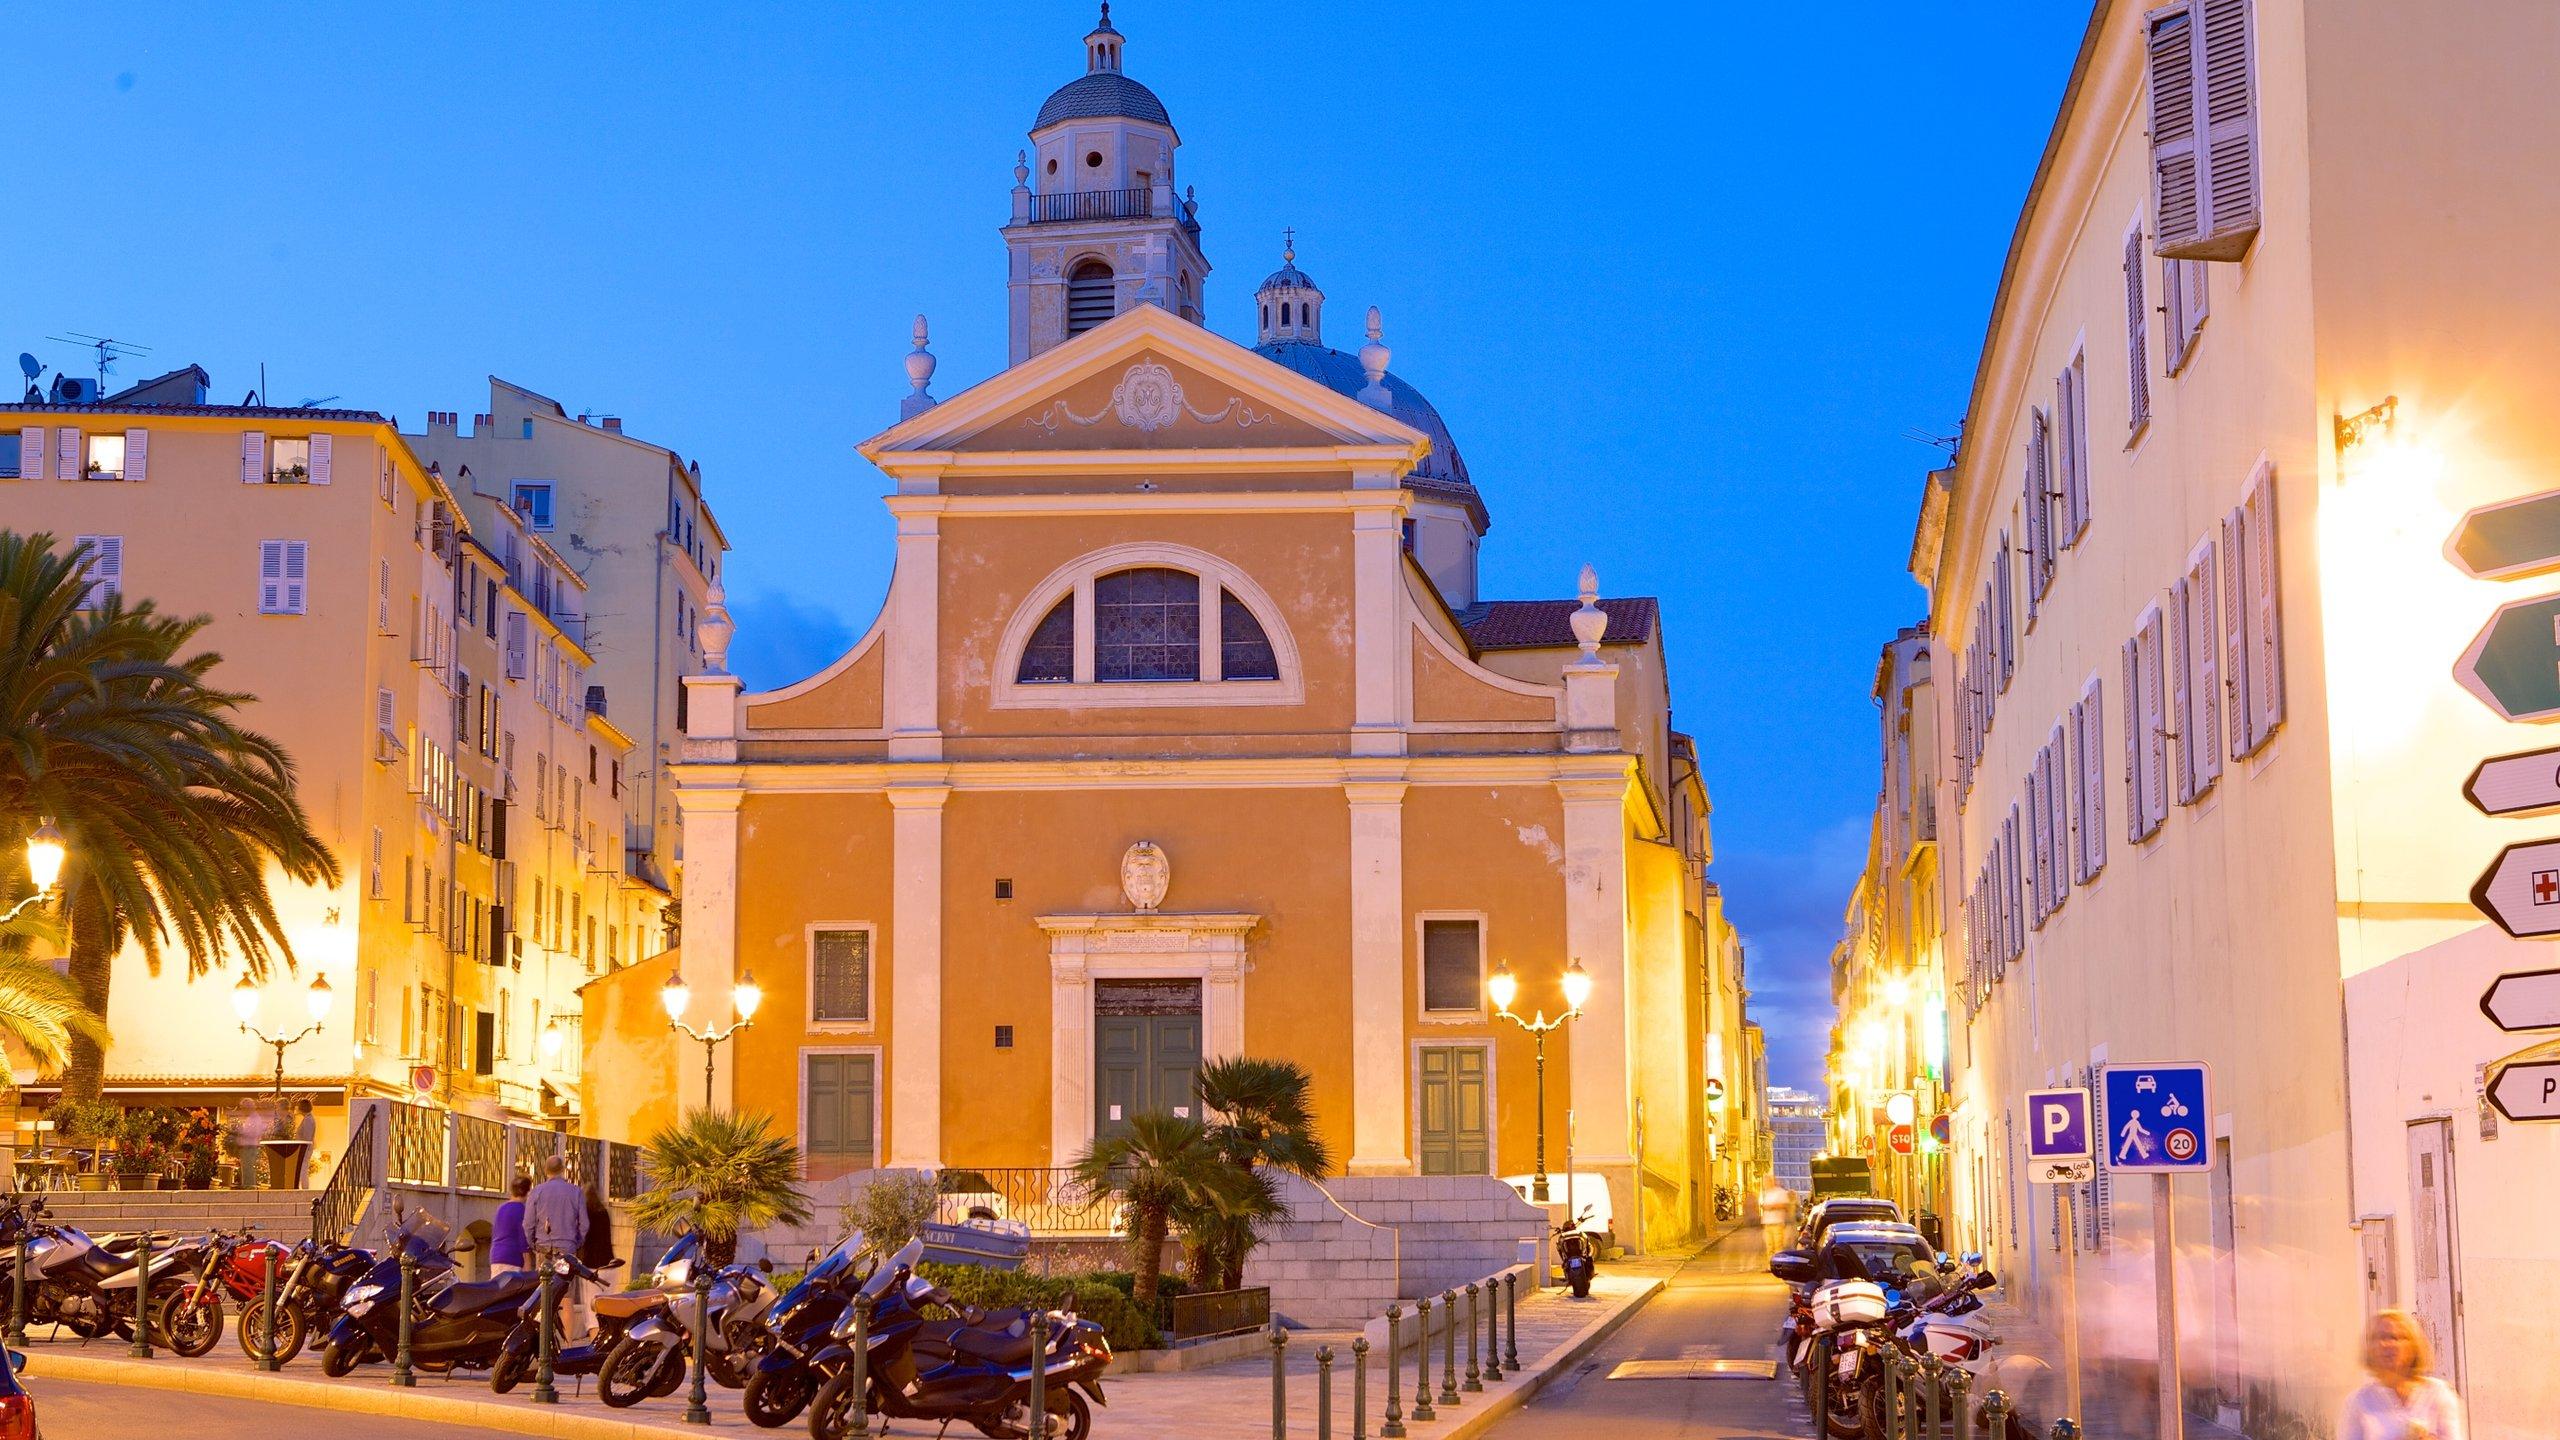 Ajaccio Cathedral, Ajaccio, Corse-du-Sud, France